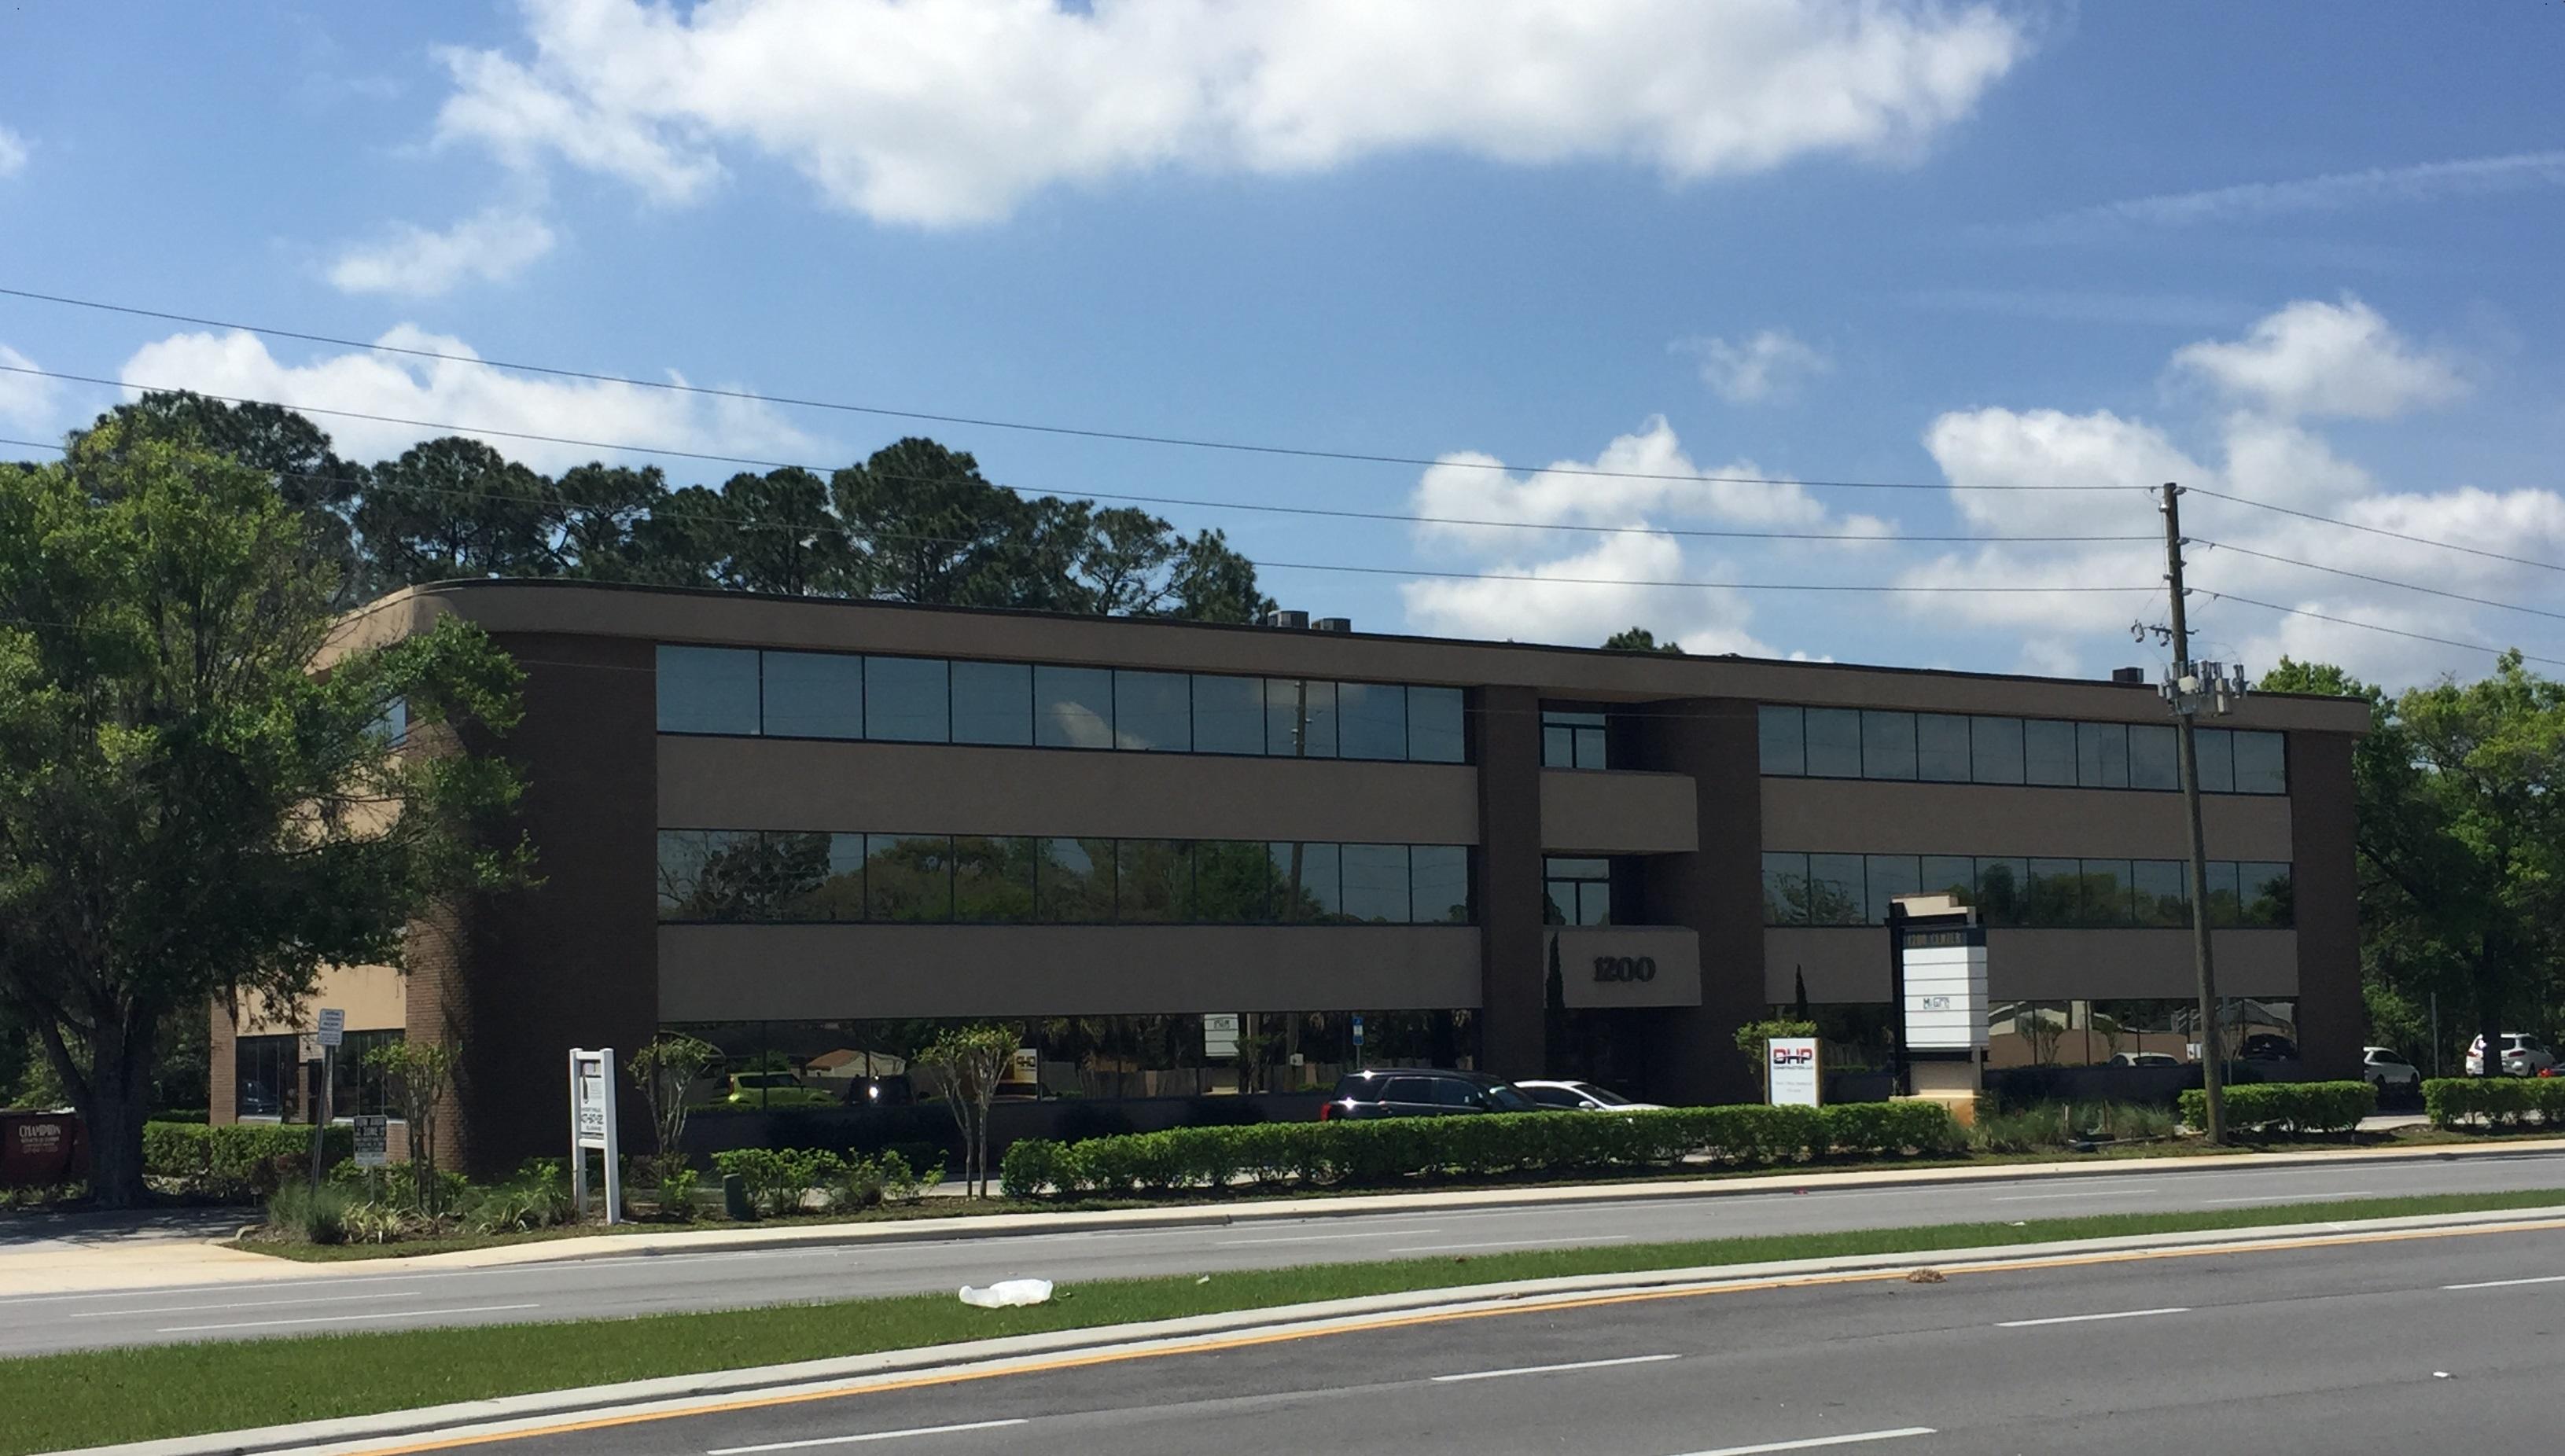 1200 Center Office Building, Longwood, FL